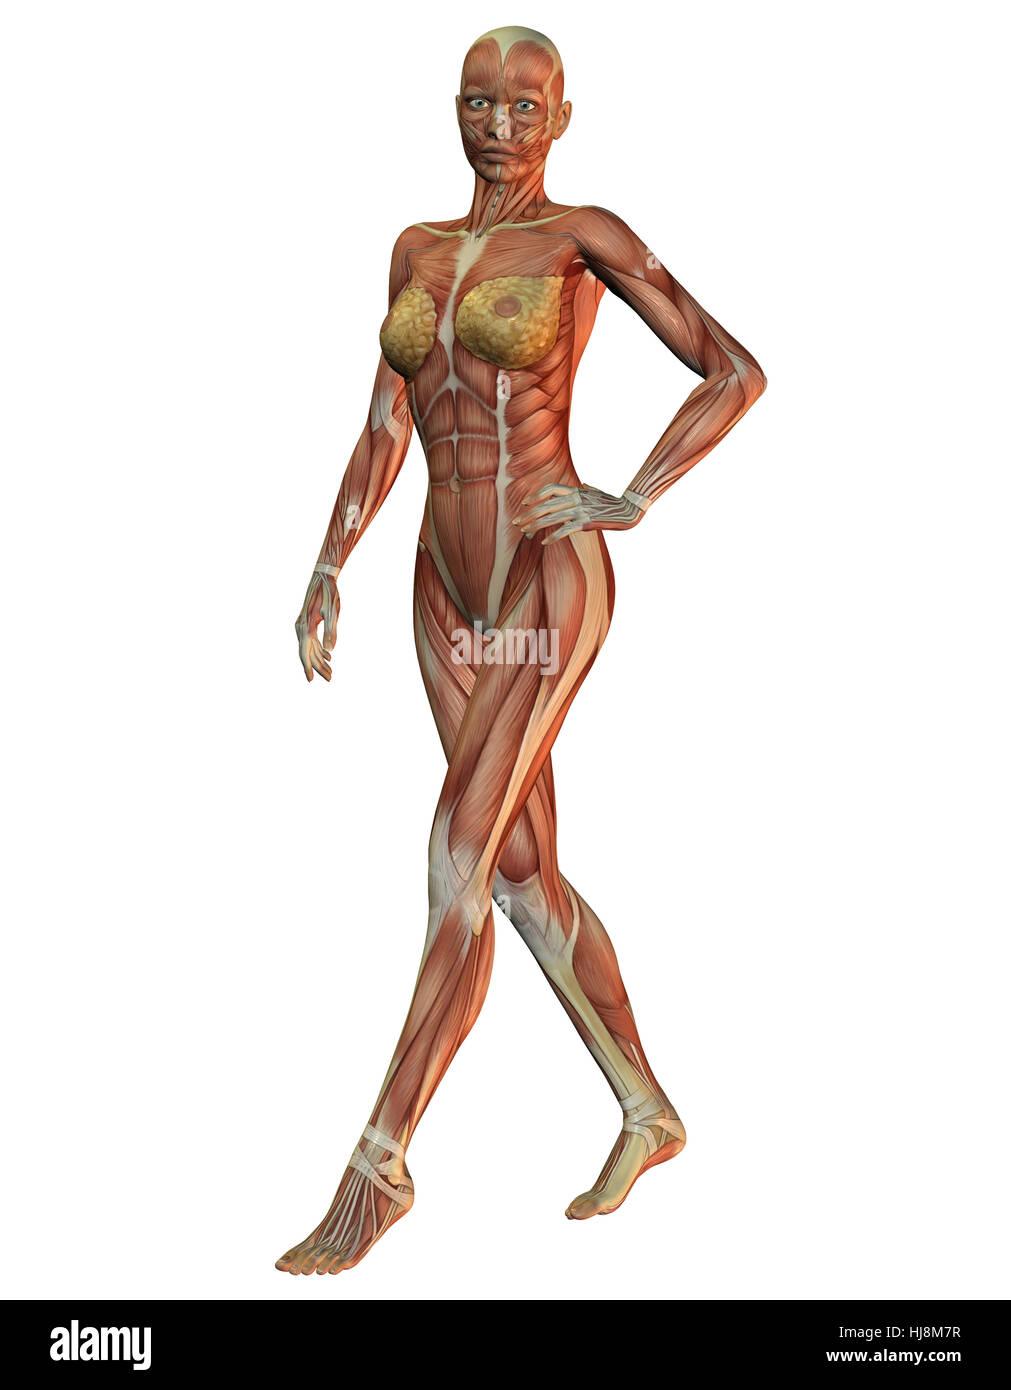 Körper Frau Medizin Stockfotos & Körper Frau Medizin Bilder - Alamy